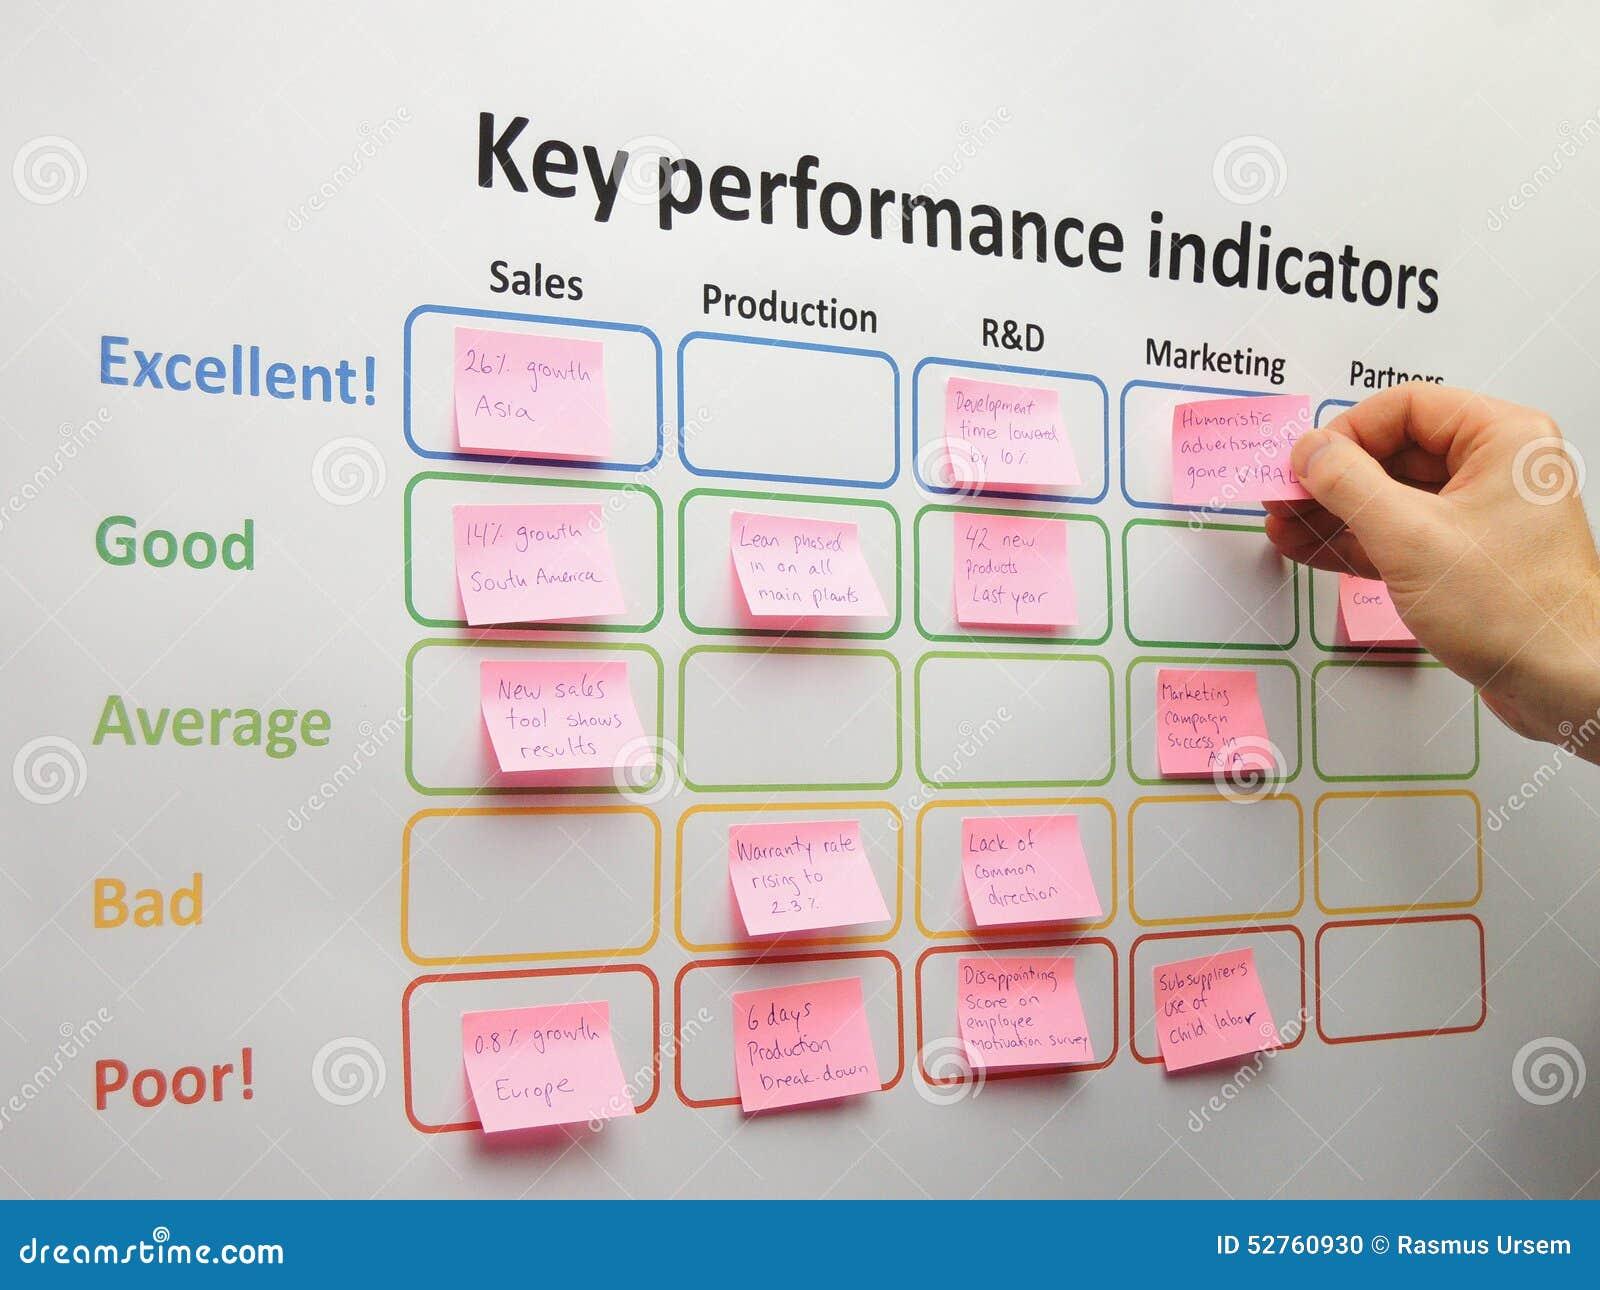 how to create key performance indicators